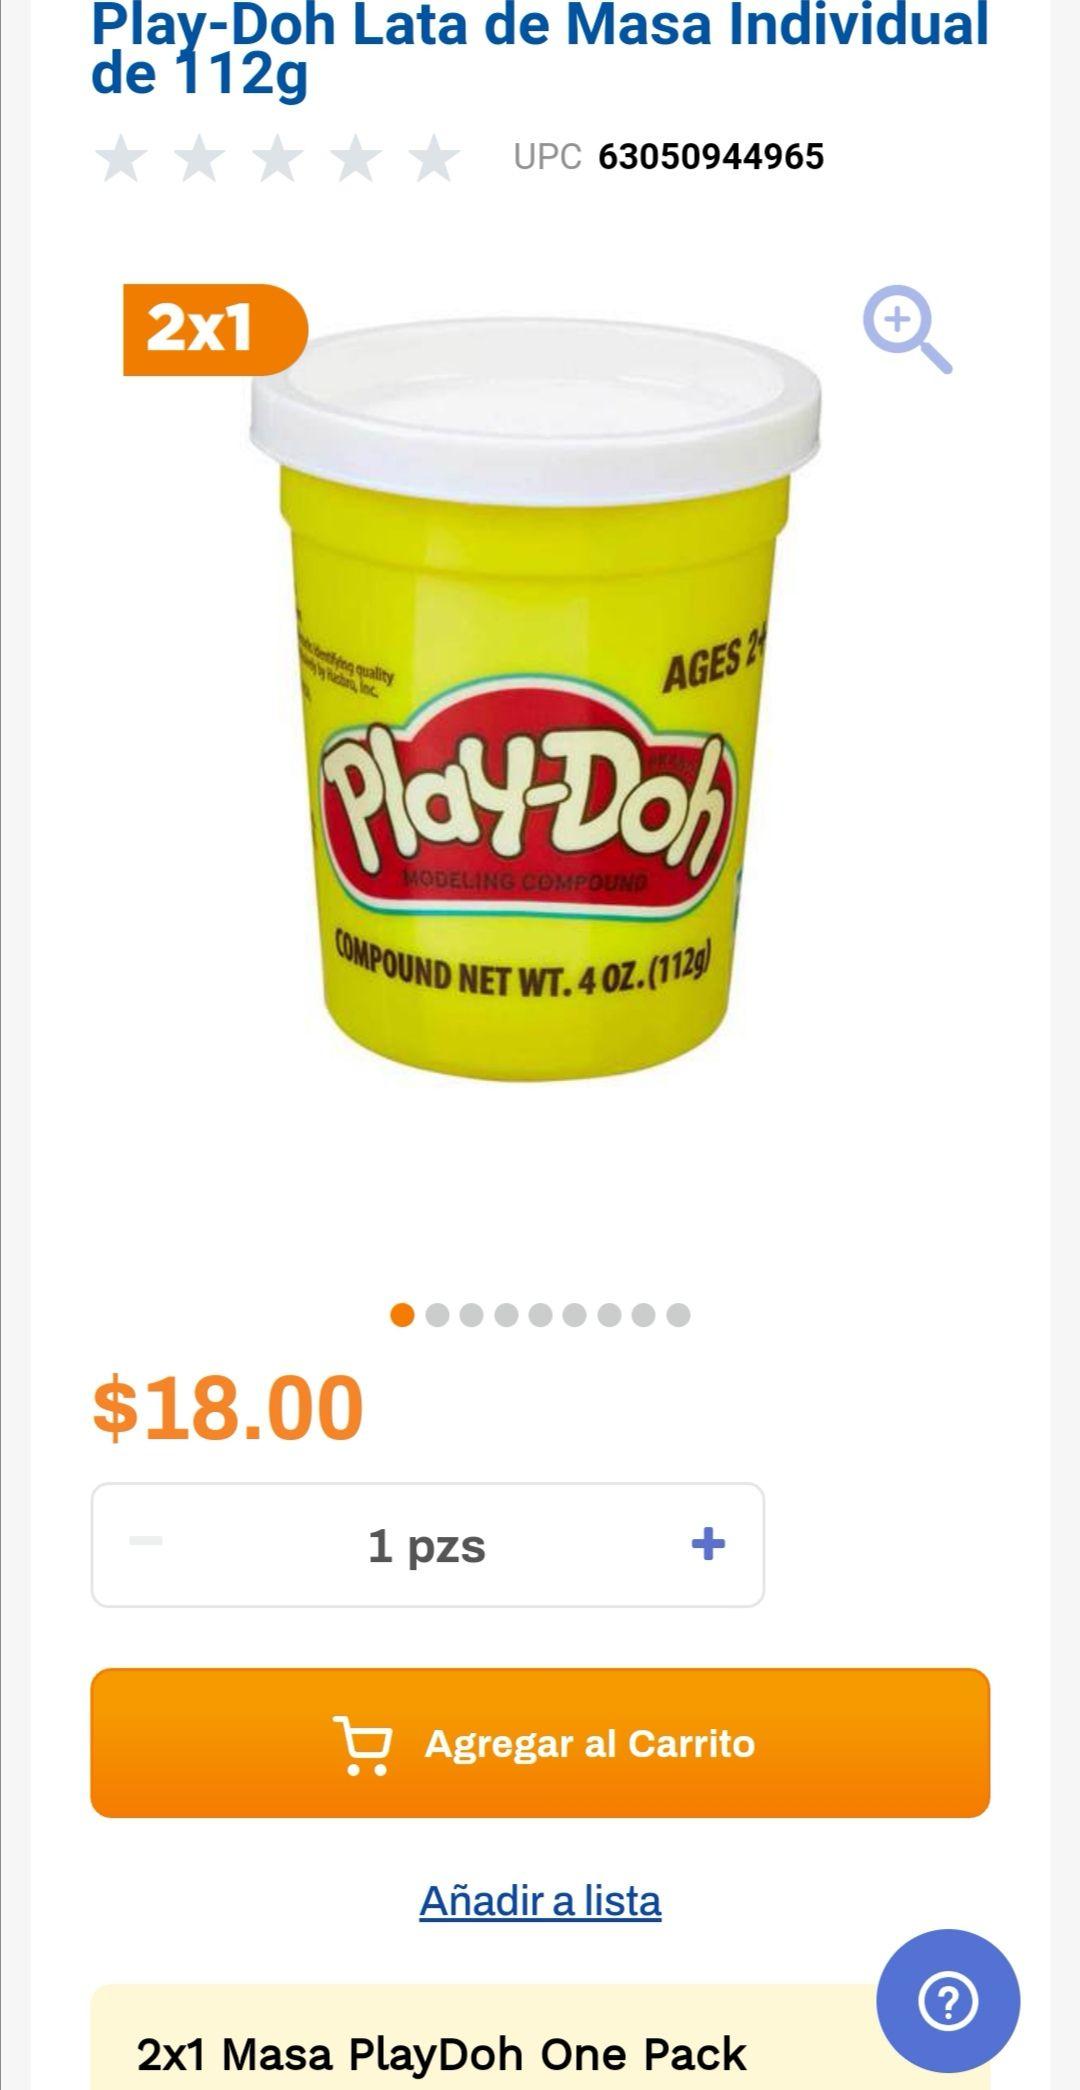 Chedraui: 2 x 1 en Play-Doh Lata de Masa Individual de 112g